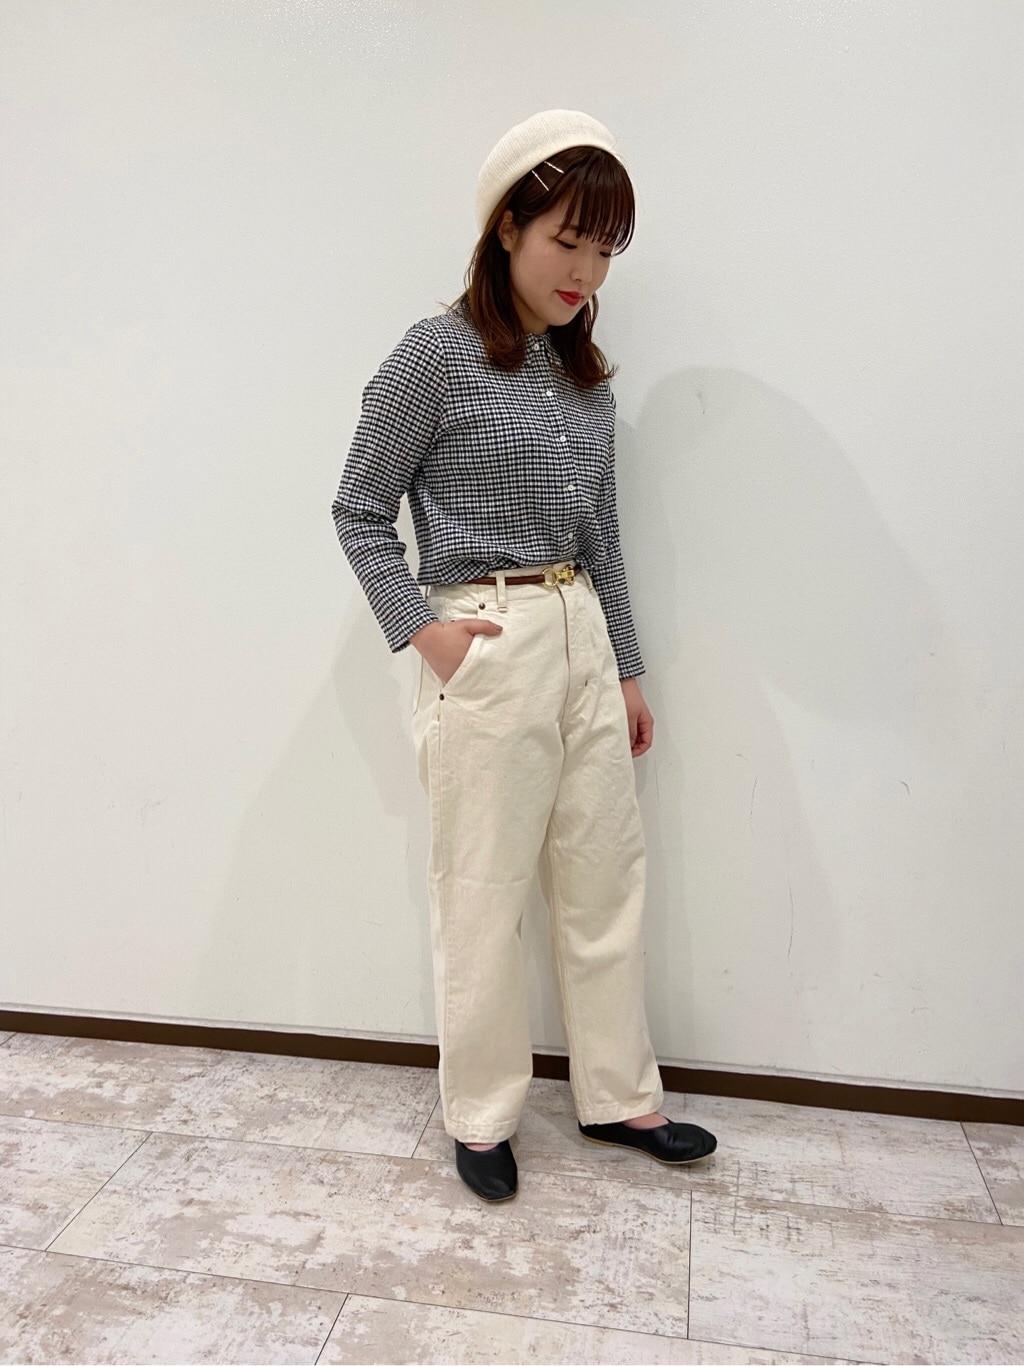 Dot and Stripes CHILD WOMAN ペリエ千葉 身長:160cm 2020.04.04